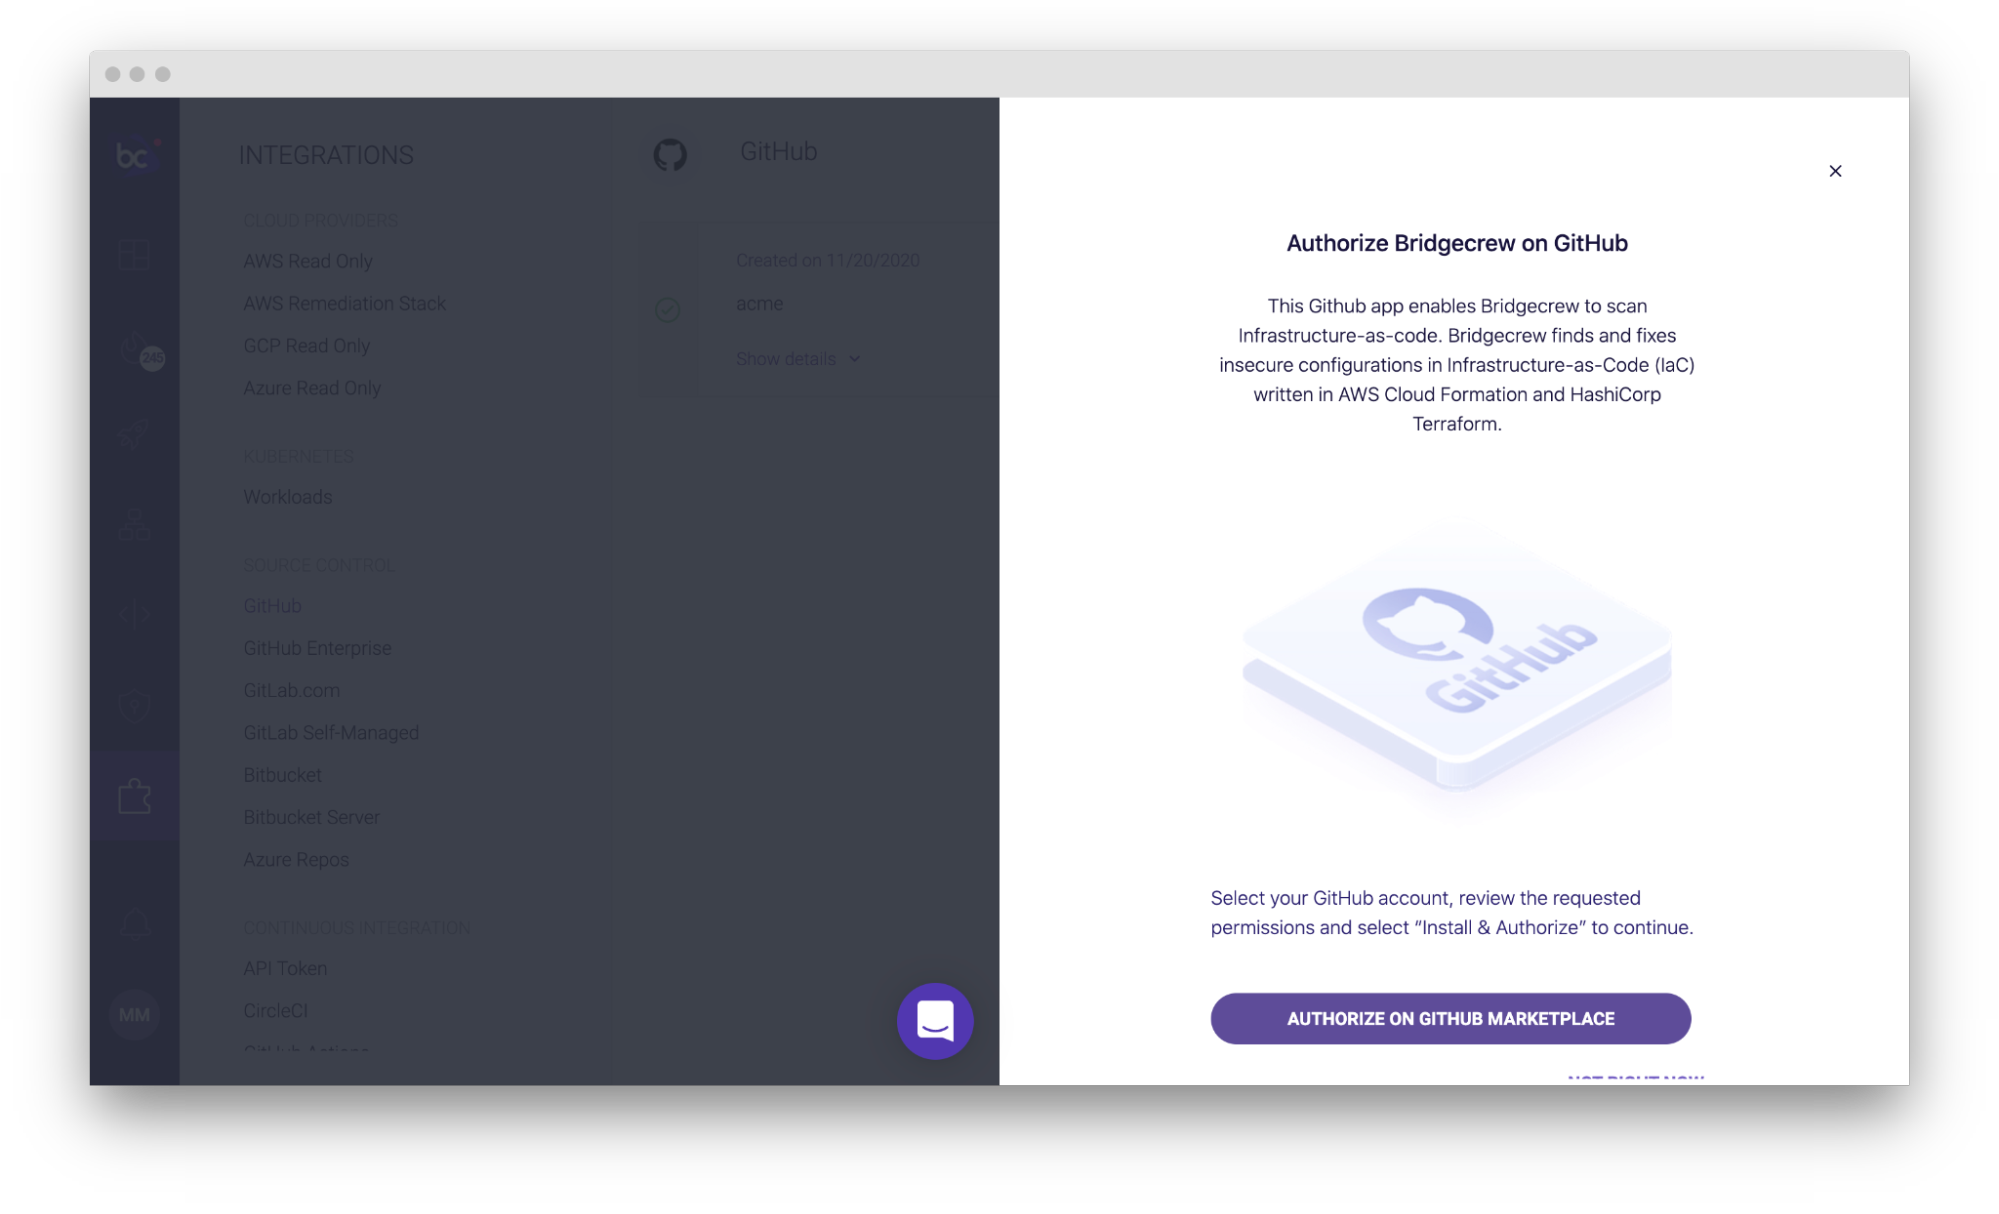 screenshot of bridgecrew authorize